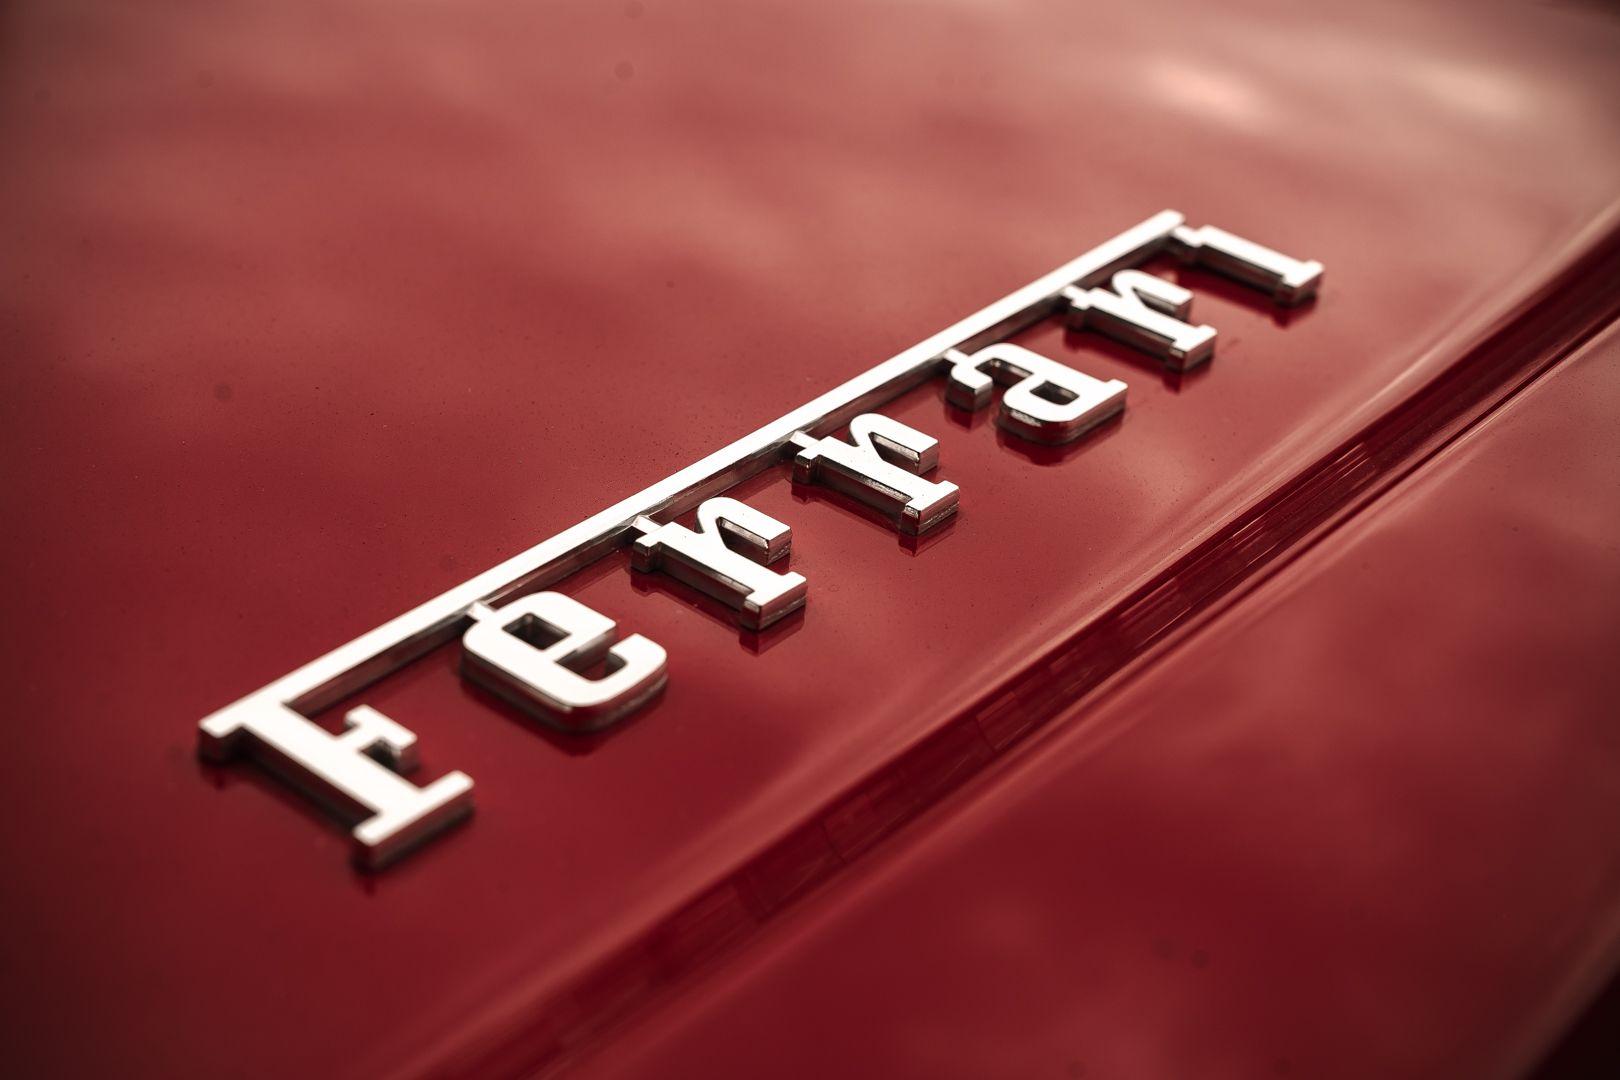 2007 Ferrari 599 GTB Fiorano 64985